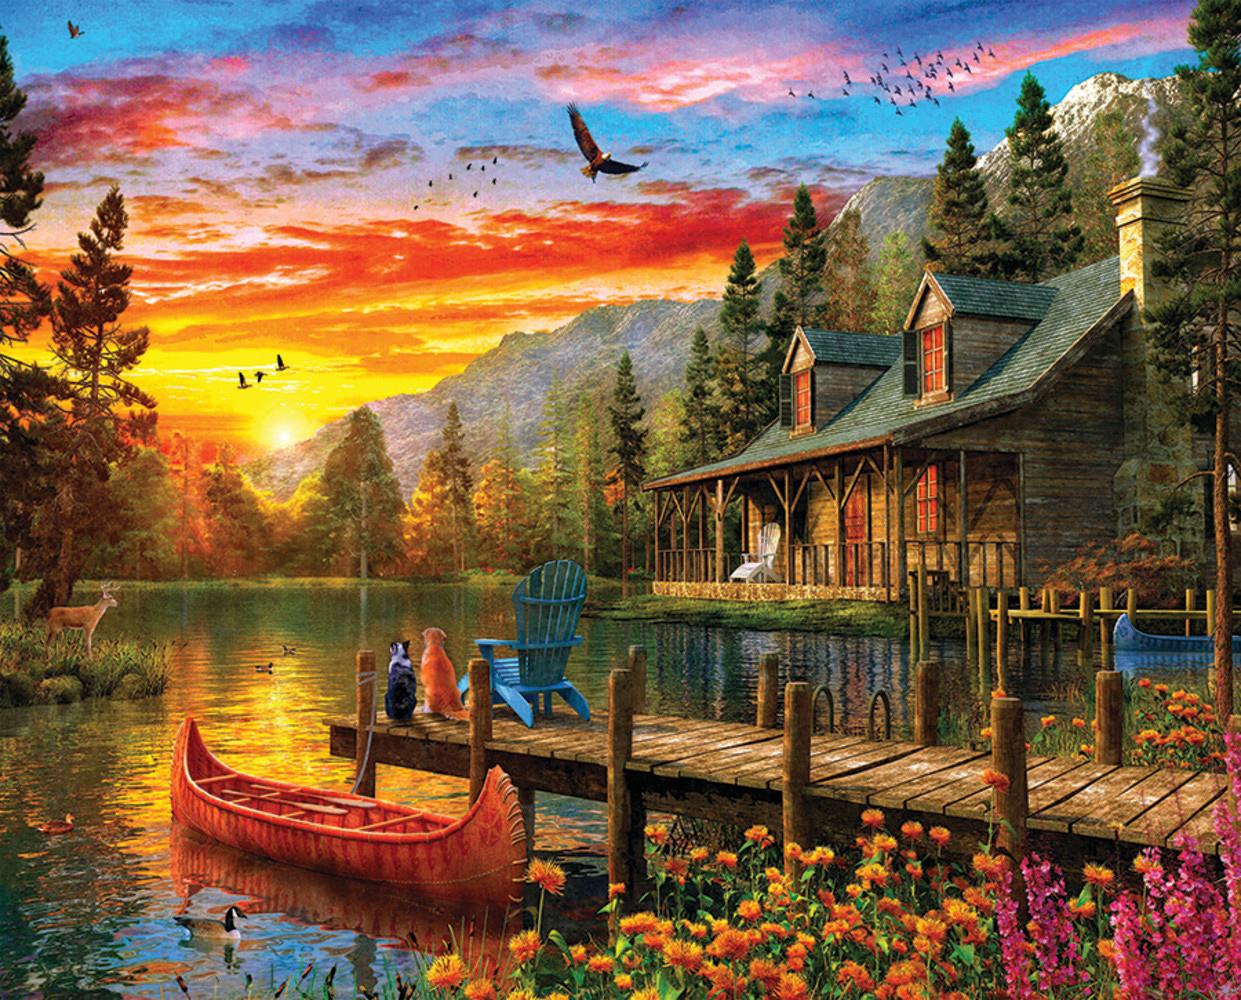 Cabin Evening Sunset Travel Jigsaw Puzzle